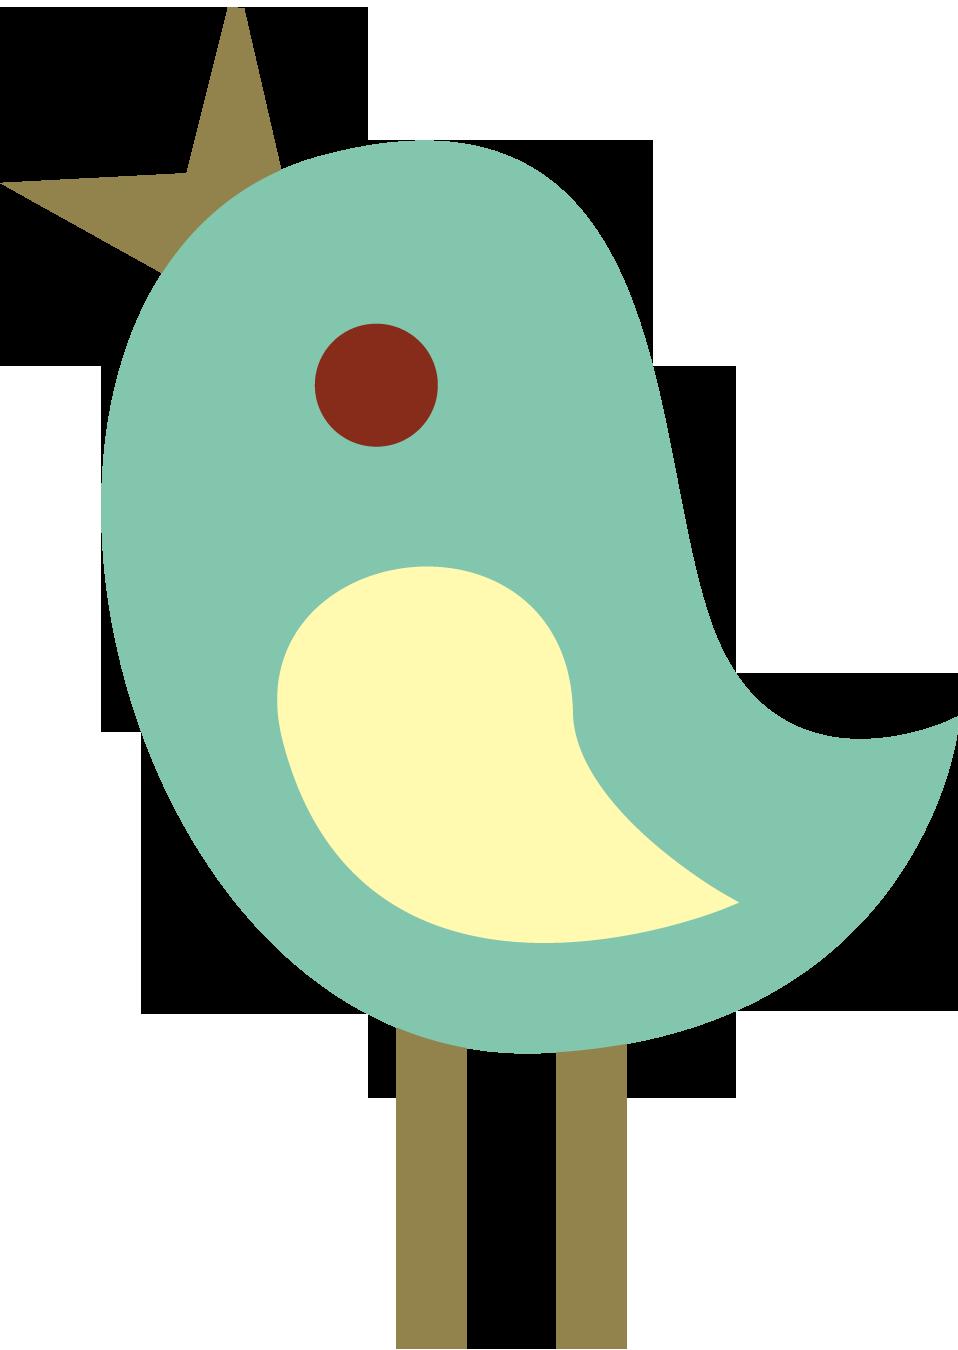 Cute Tweet Birds Clip Art Free Clipart Graphics Revidevi Wordpress